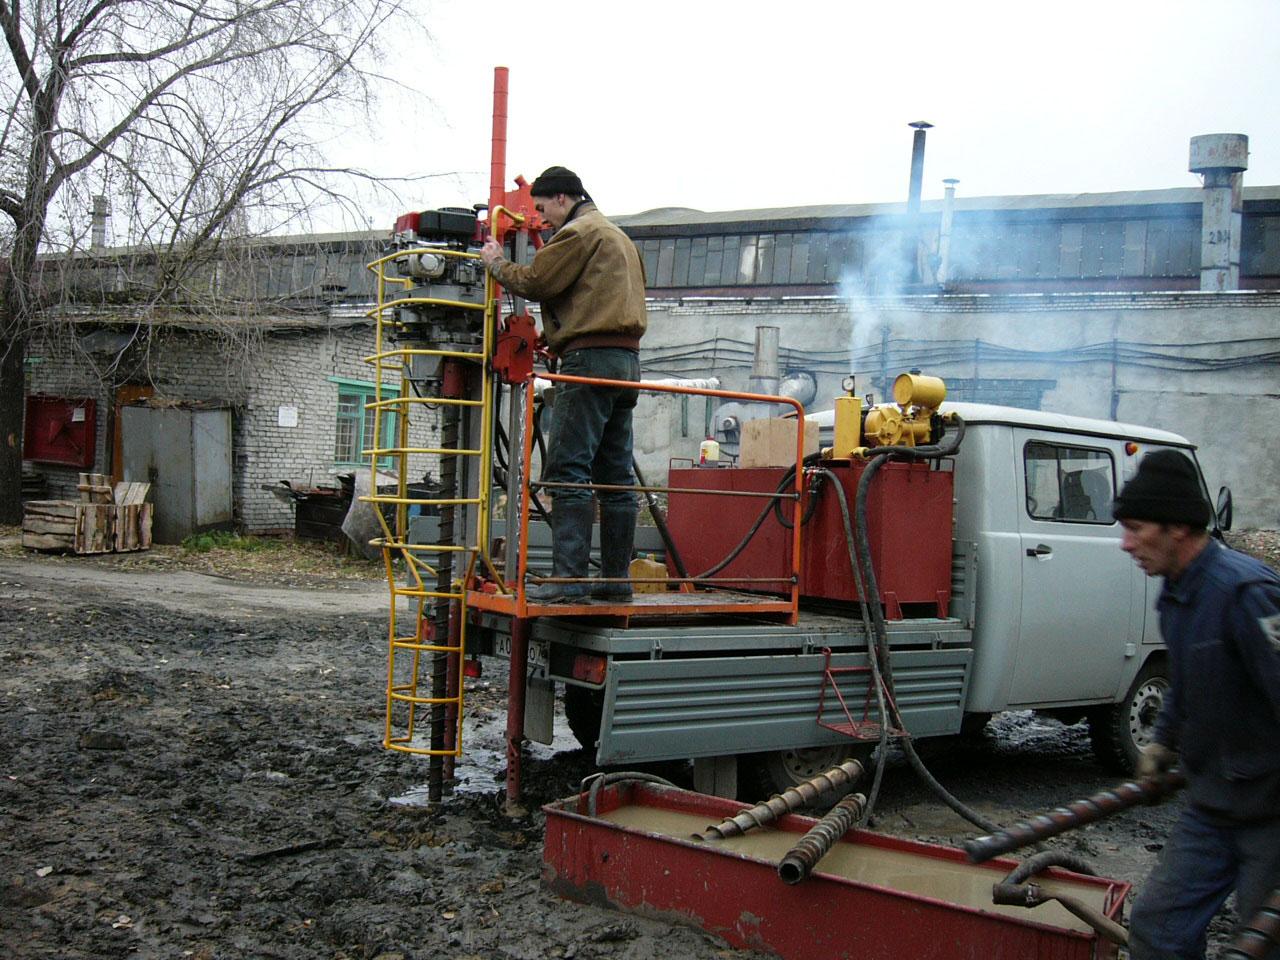 Установка буровая шнековая малогабаритная УБШМ-1-13 на базе УАЗ Фермер